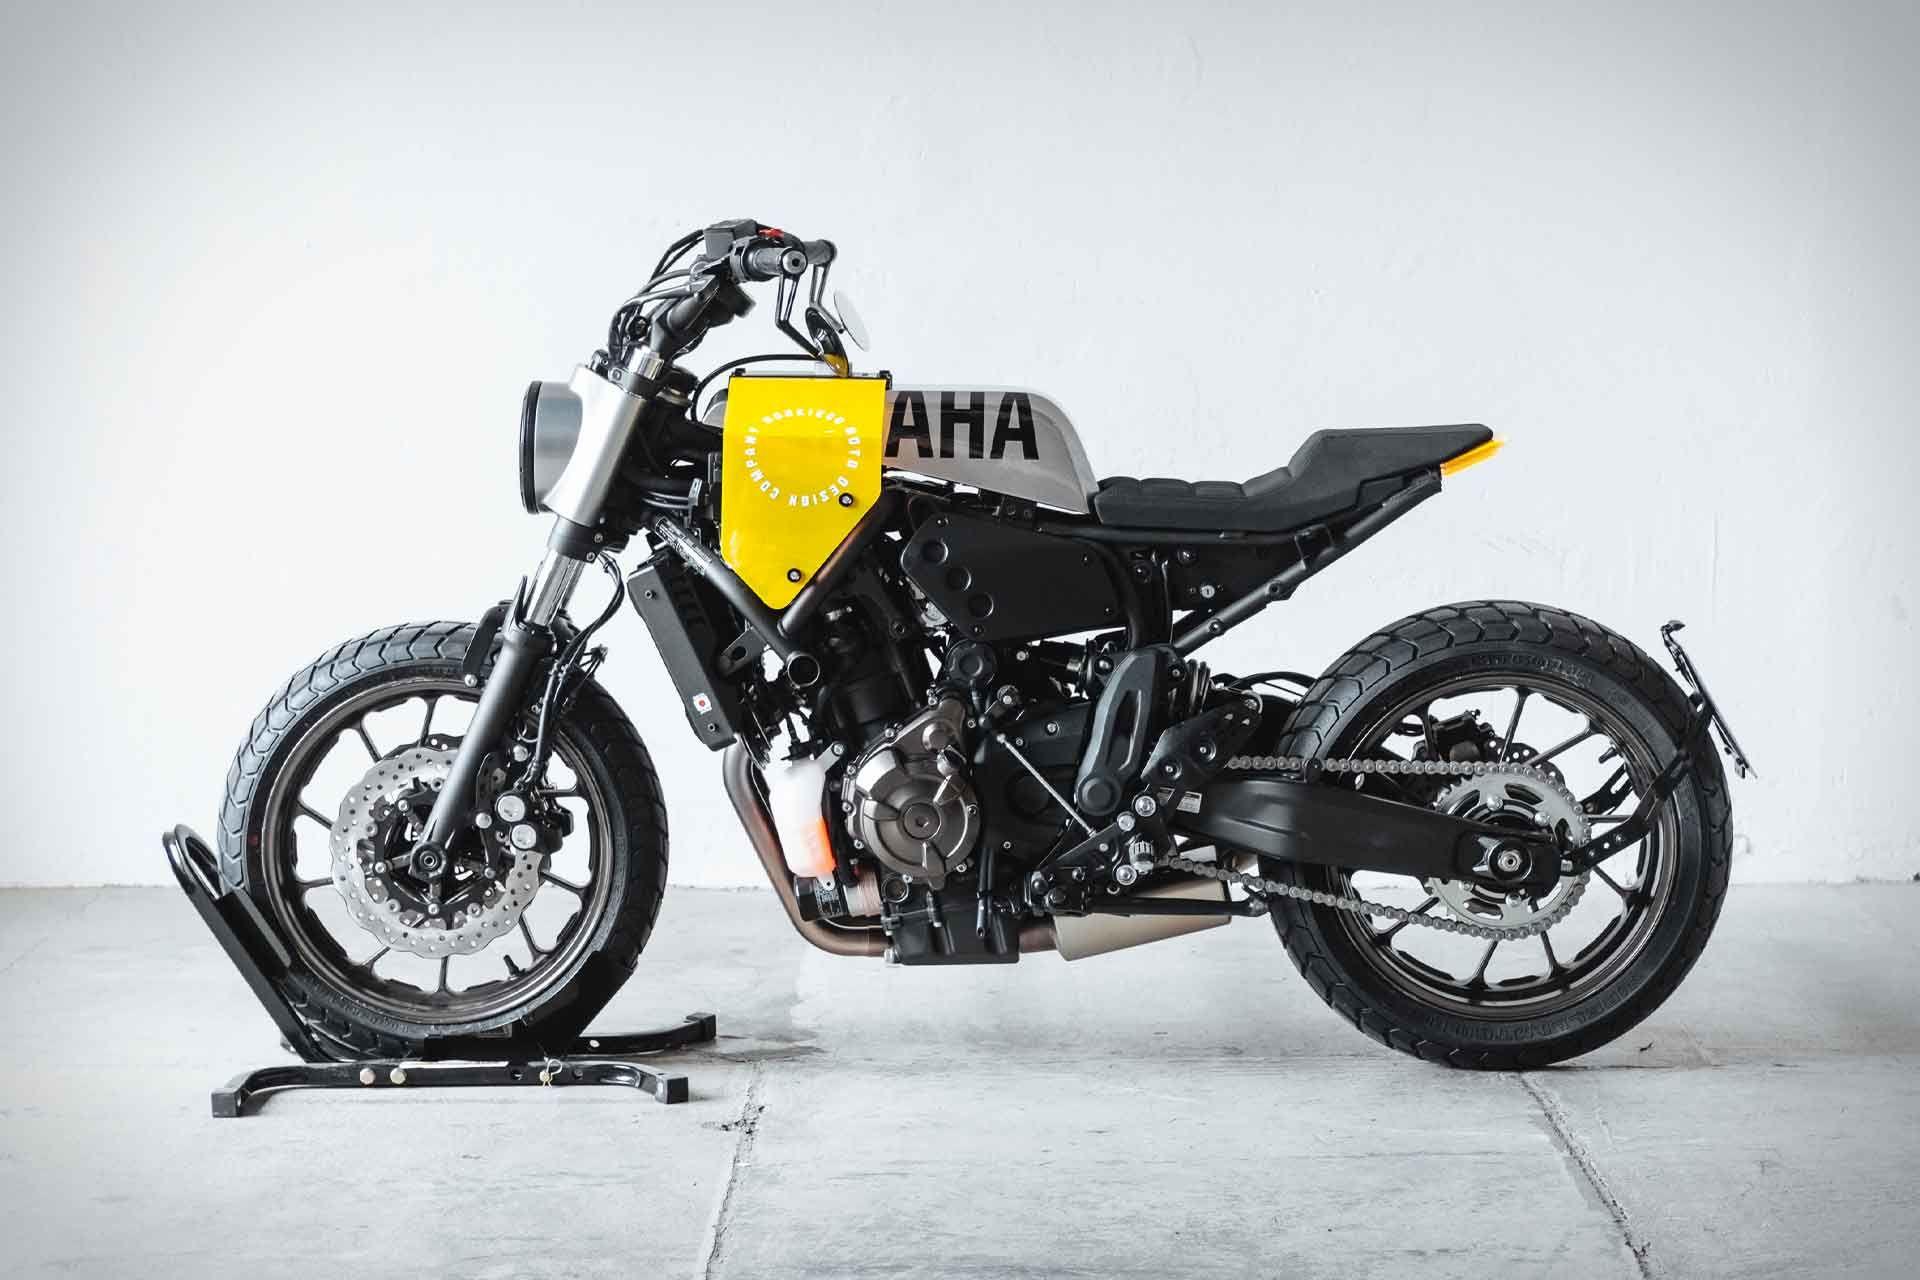 Awe Inspiring Hookie Co Yard Built Yamaha Xsr700 Motorcycle Evergreenethics Interior Chair Design Evergreenethicsorg